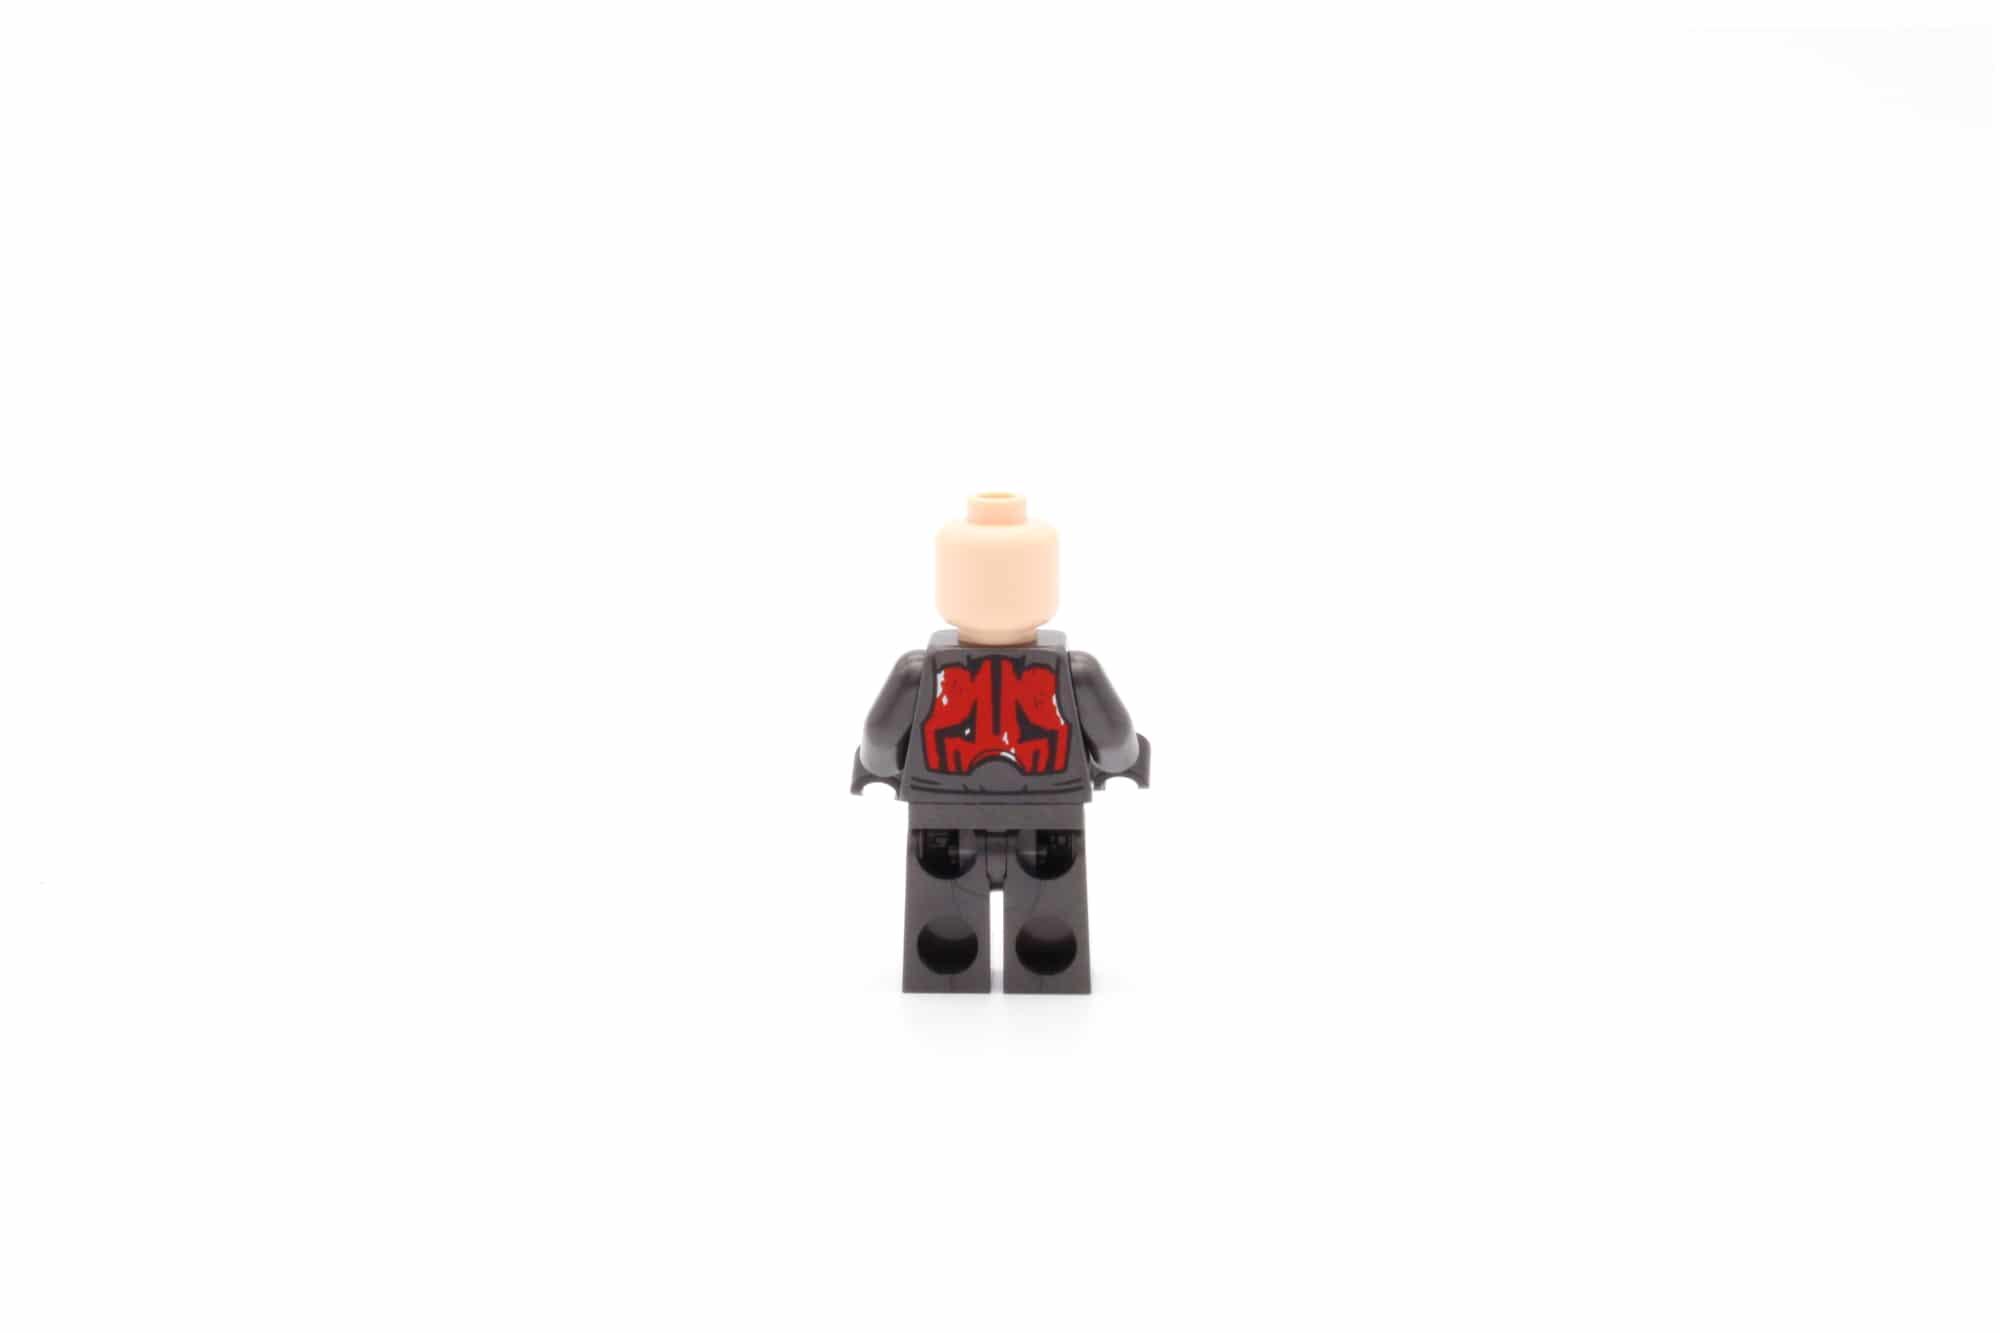 LEGO Star Wars 75316 Mandalorian Starfighter 10